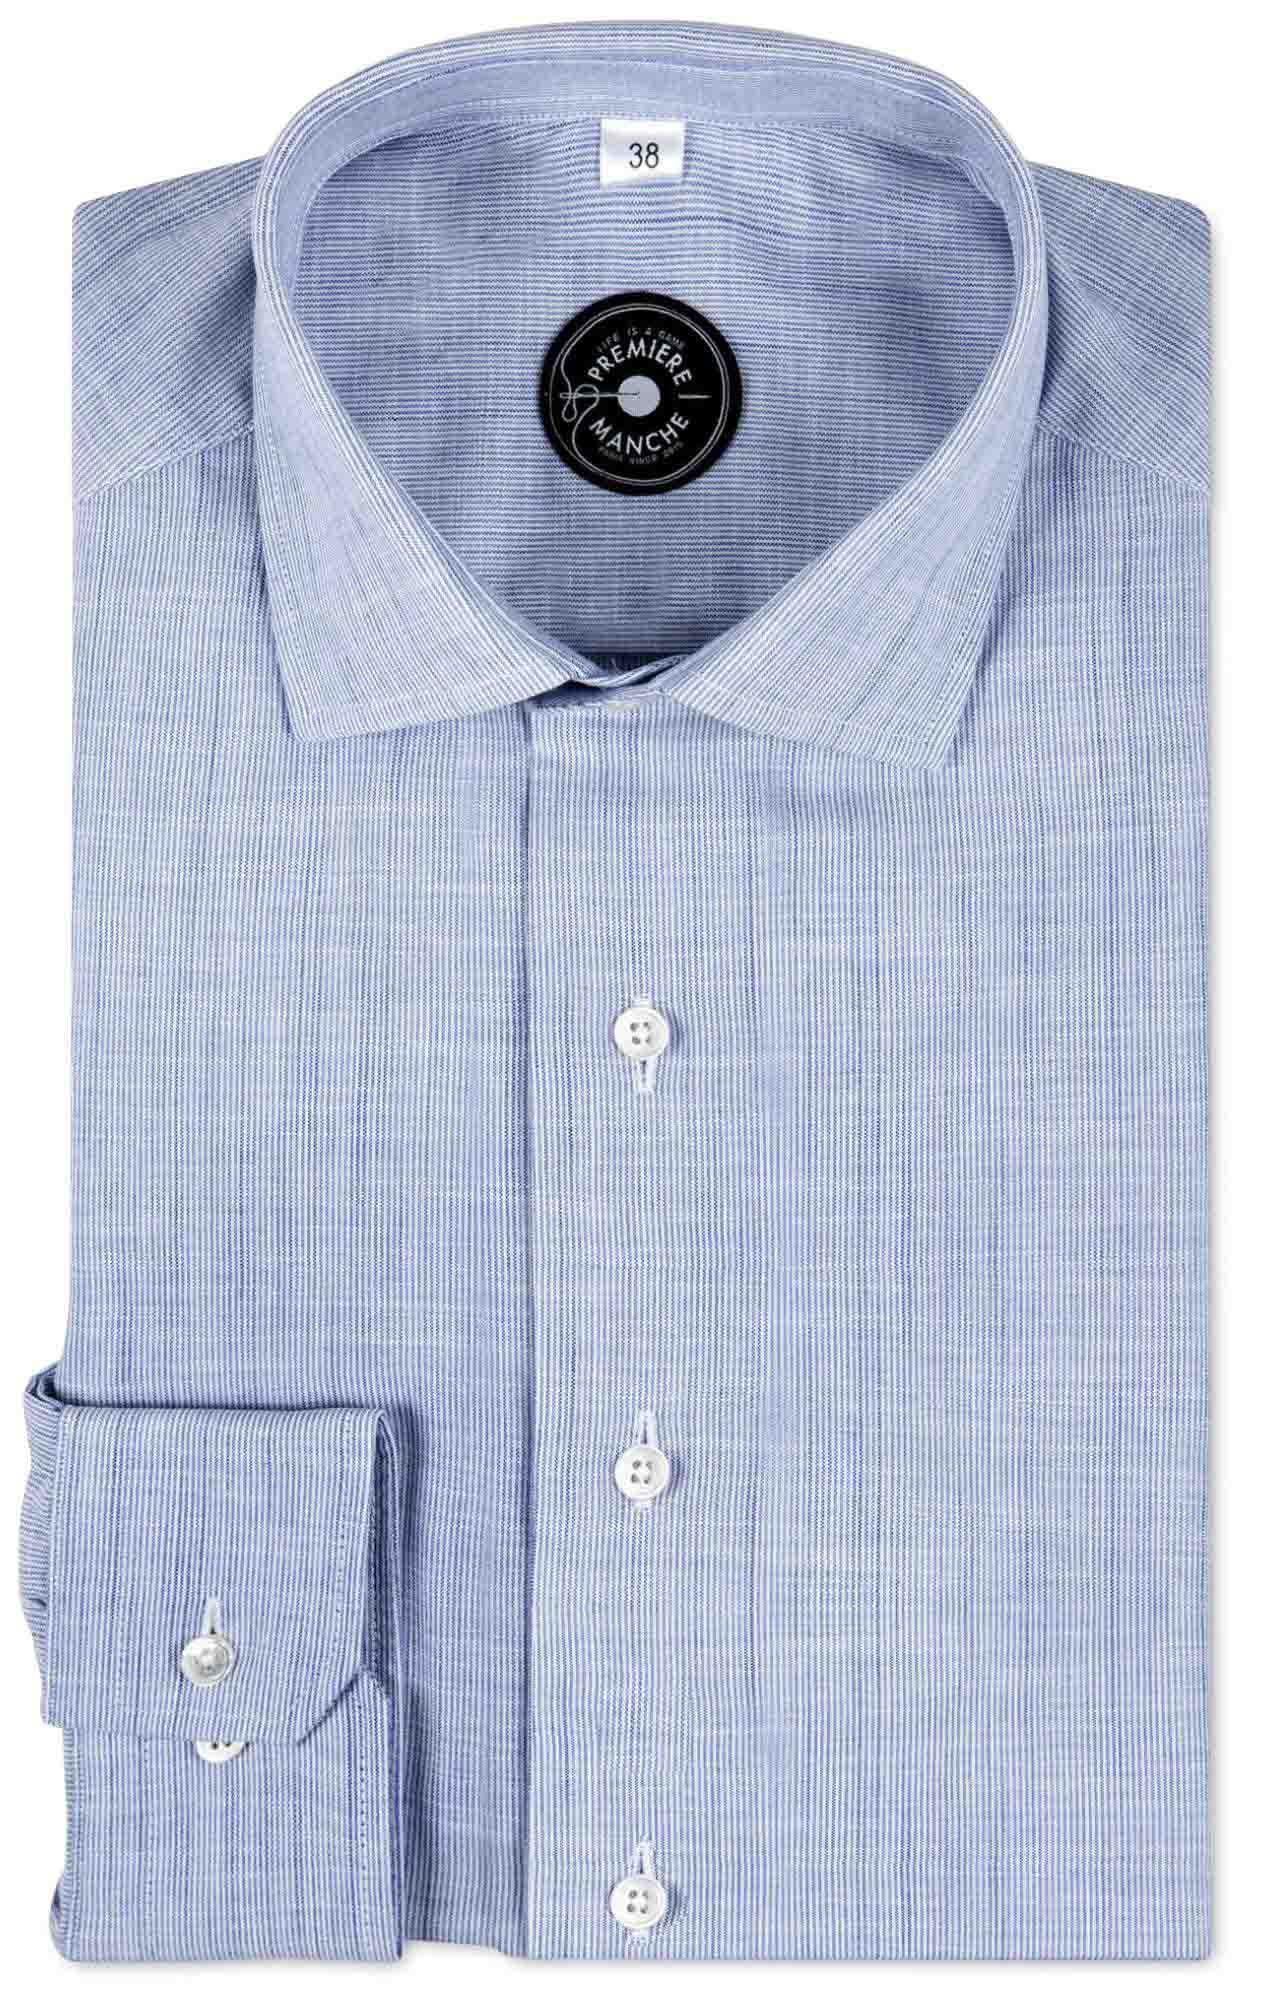 Chemise chambray bleu rayé Chemises Hommes